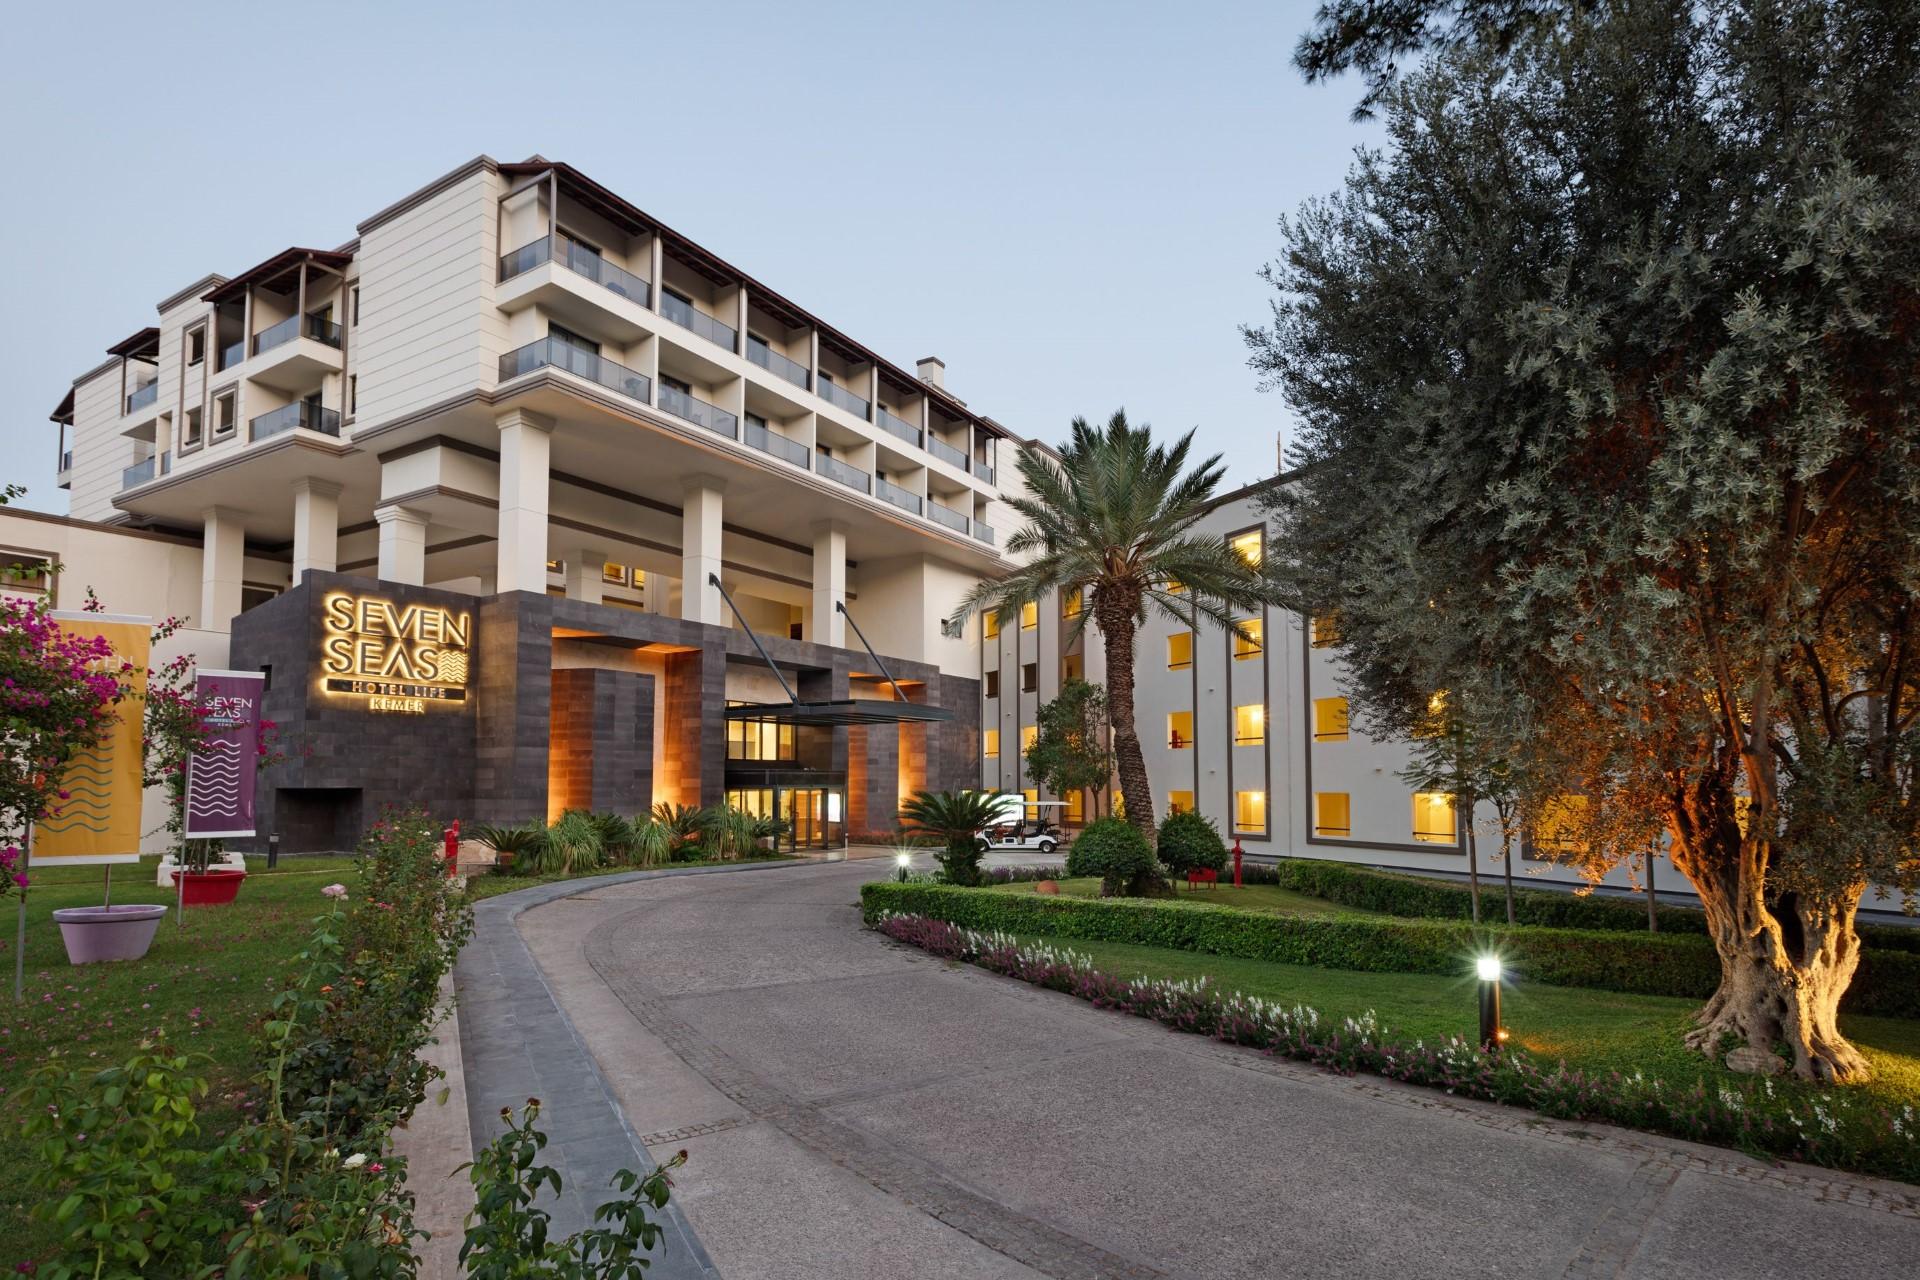 Seven Seas Hotel Life